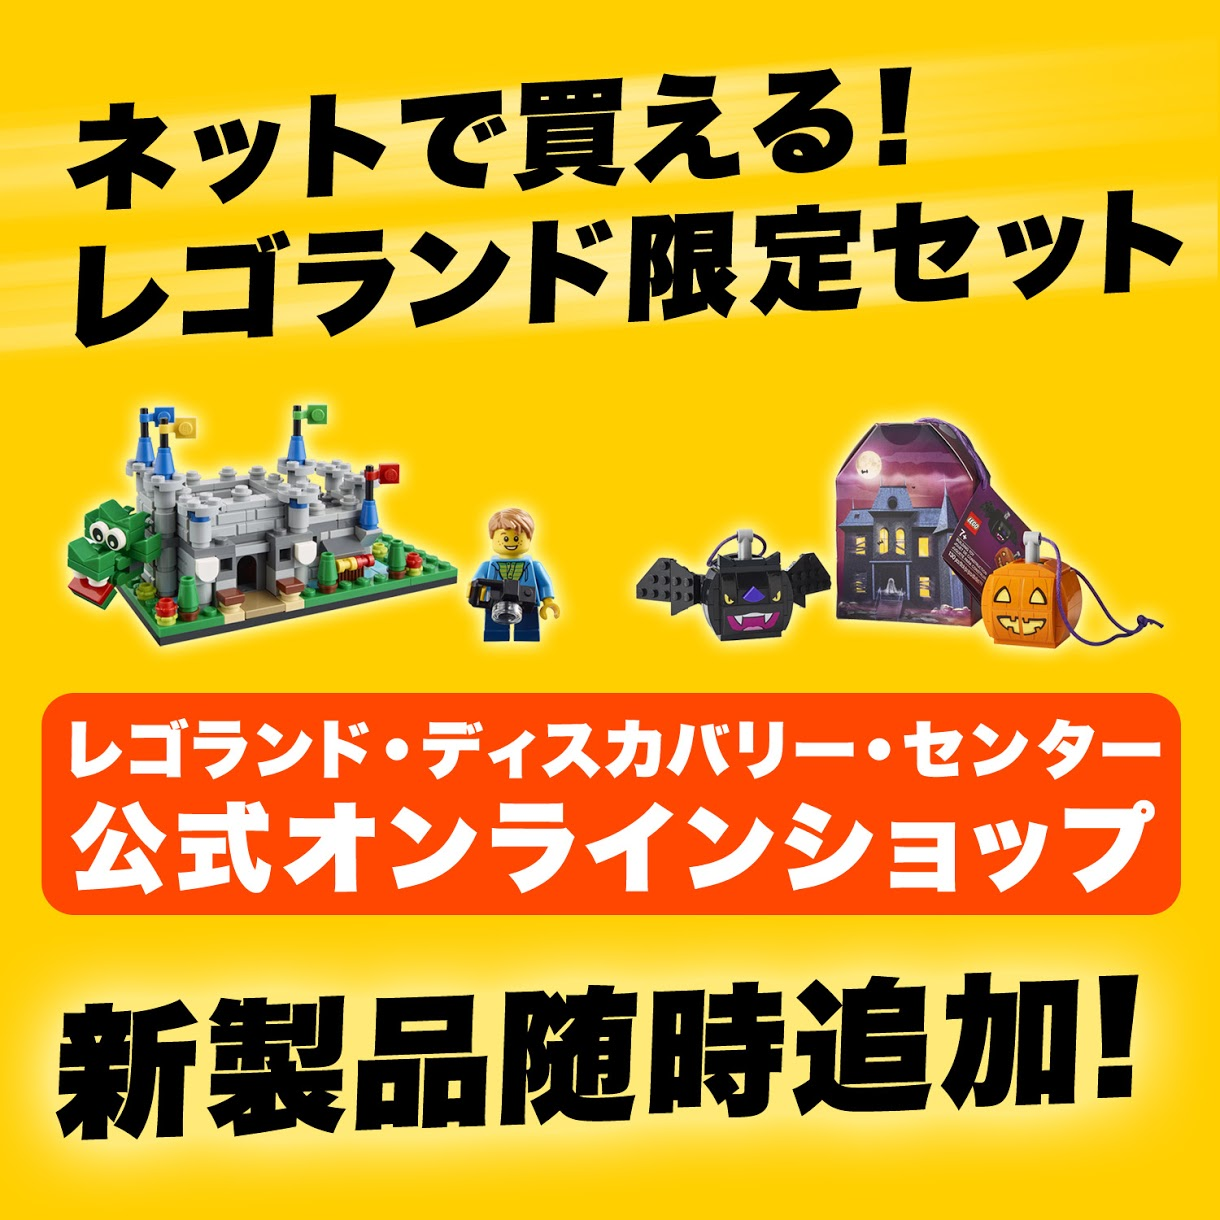 【LDC公式オンライン】ここでしか買えないレゴランド限定新着セットをチェック!